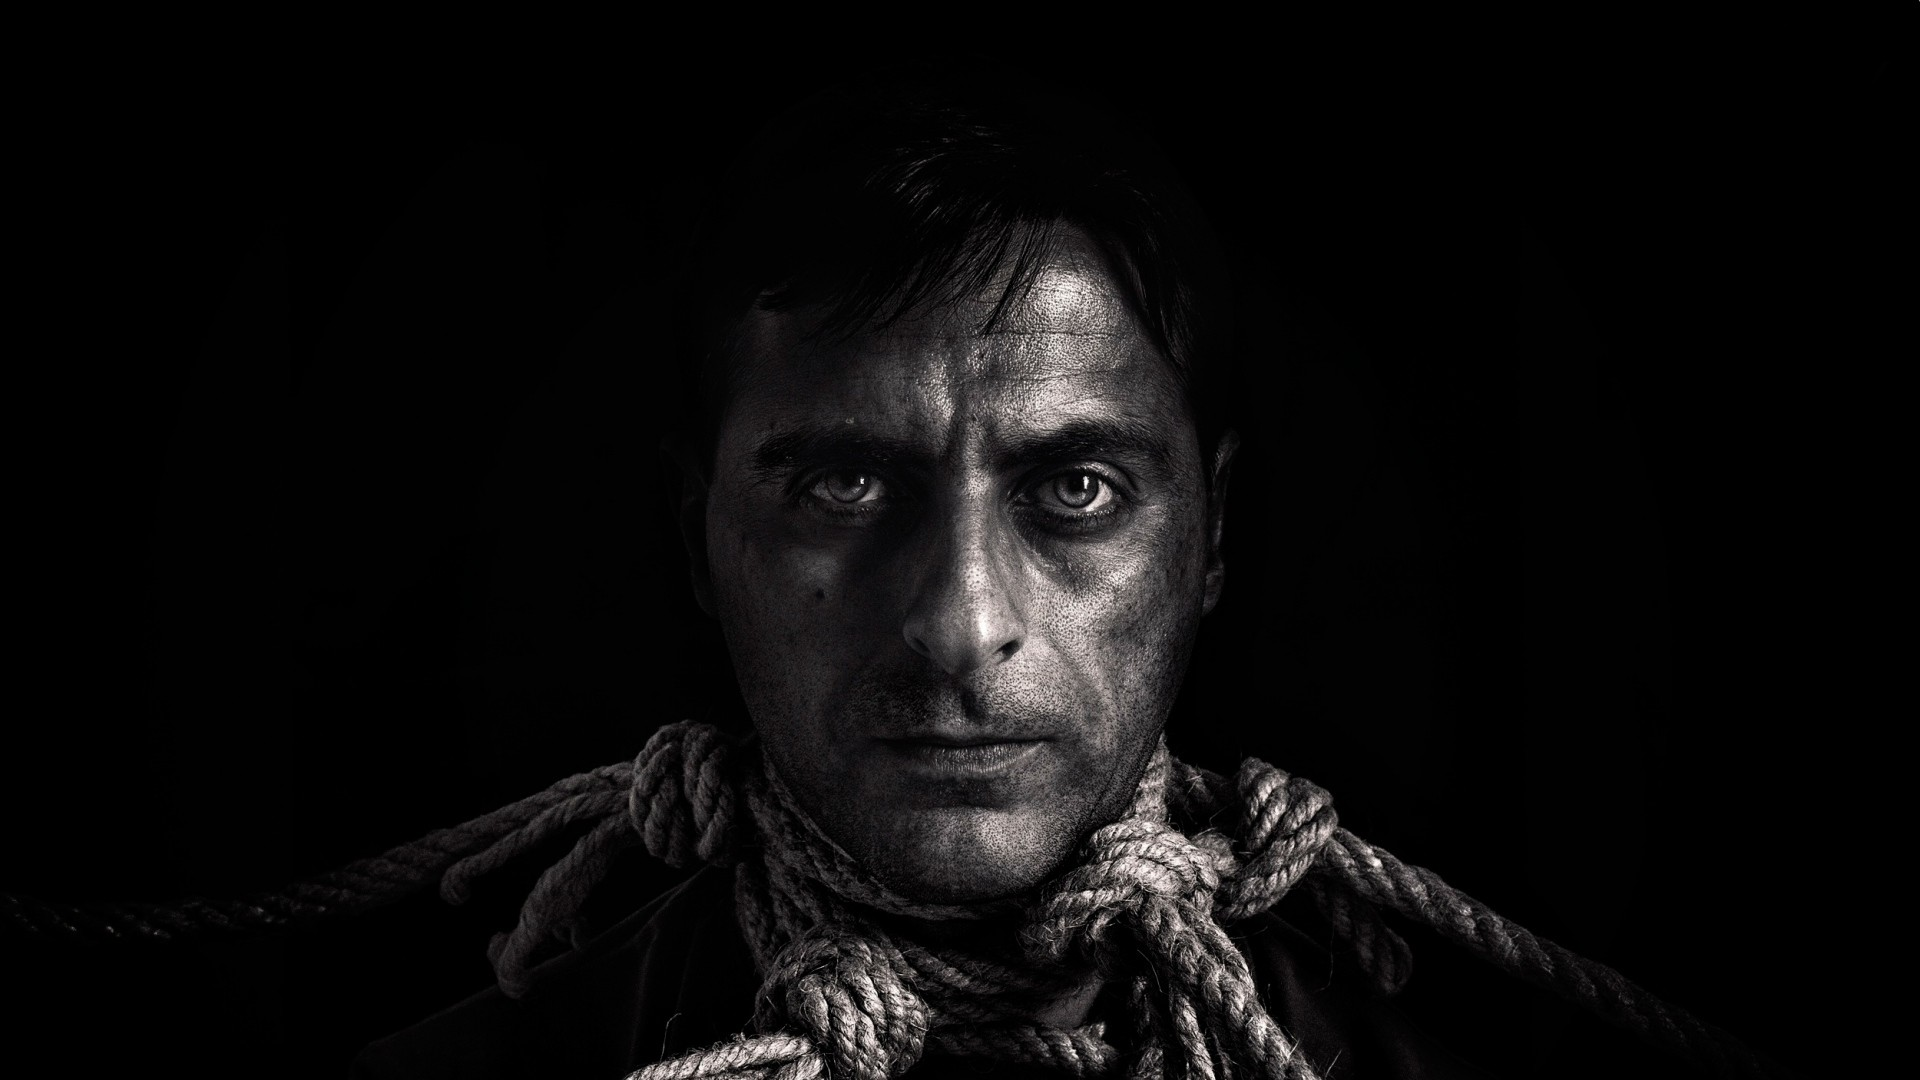 Wallpaper man, rope, person, portrait, bw